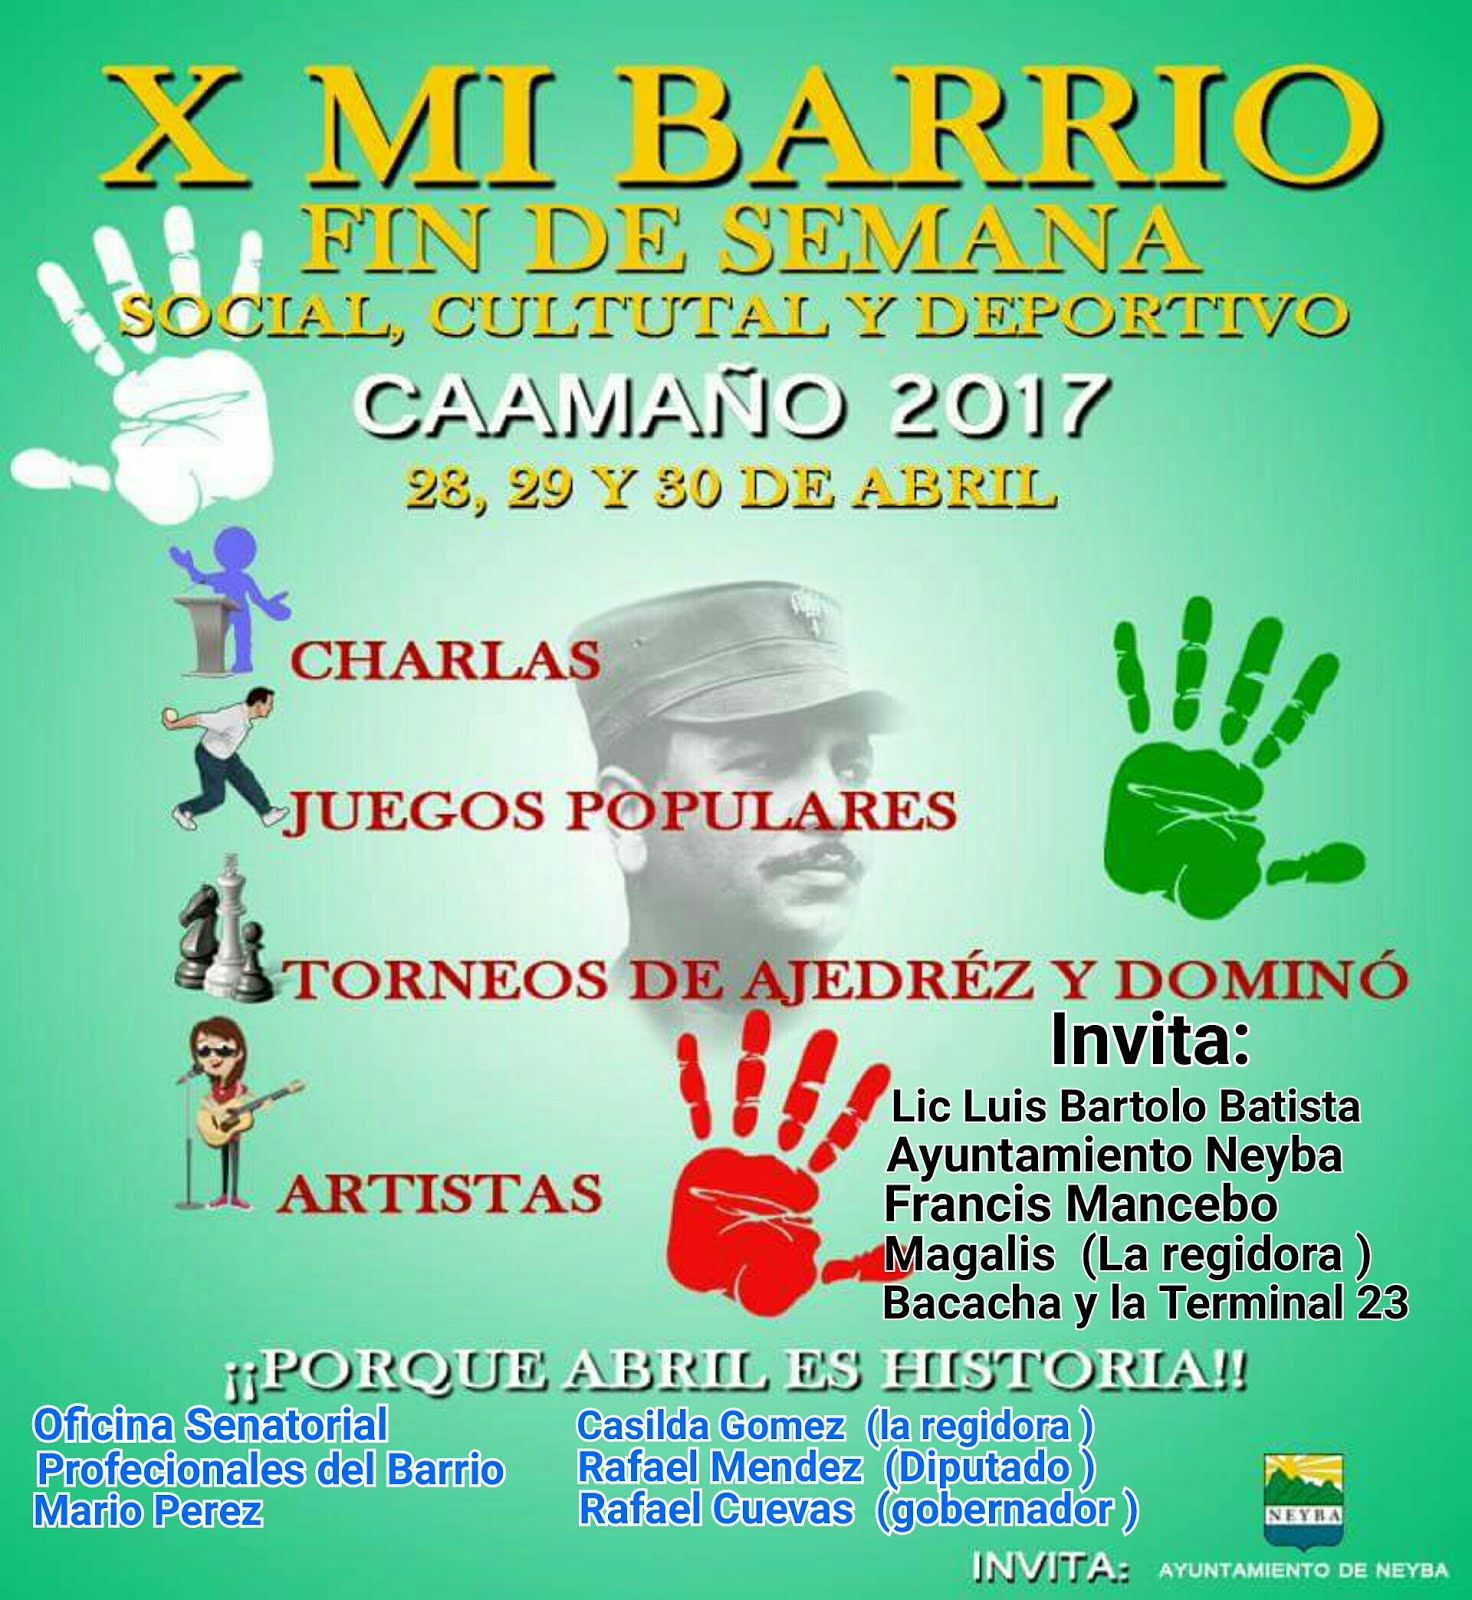 X MI BARRIO Caamaño 2017